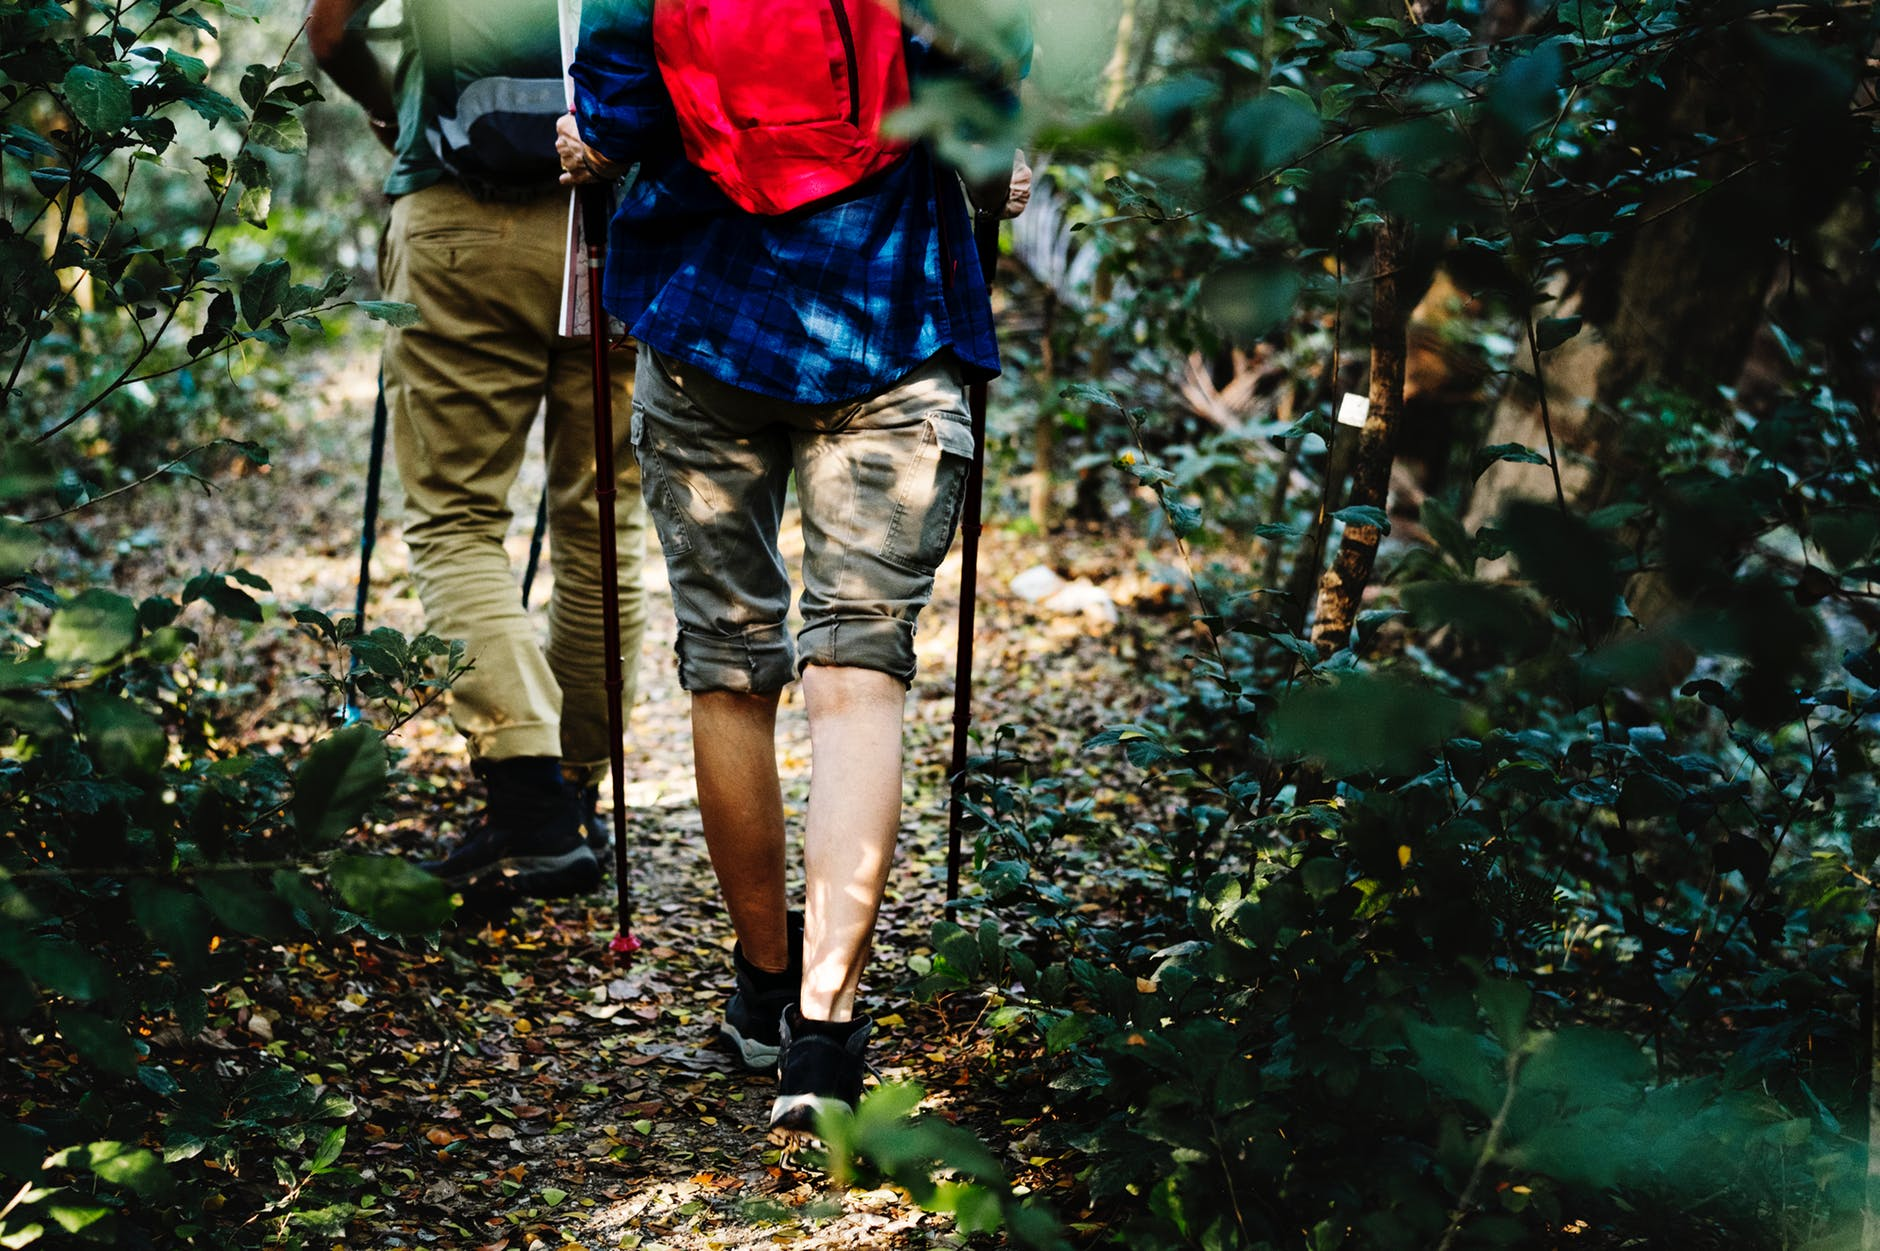 trail hiking and backpacking